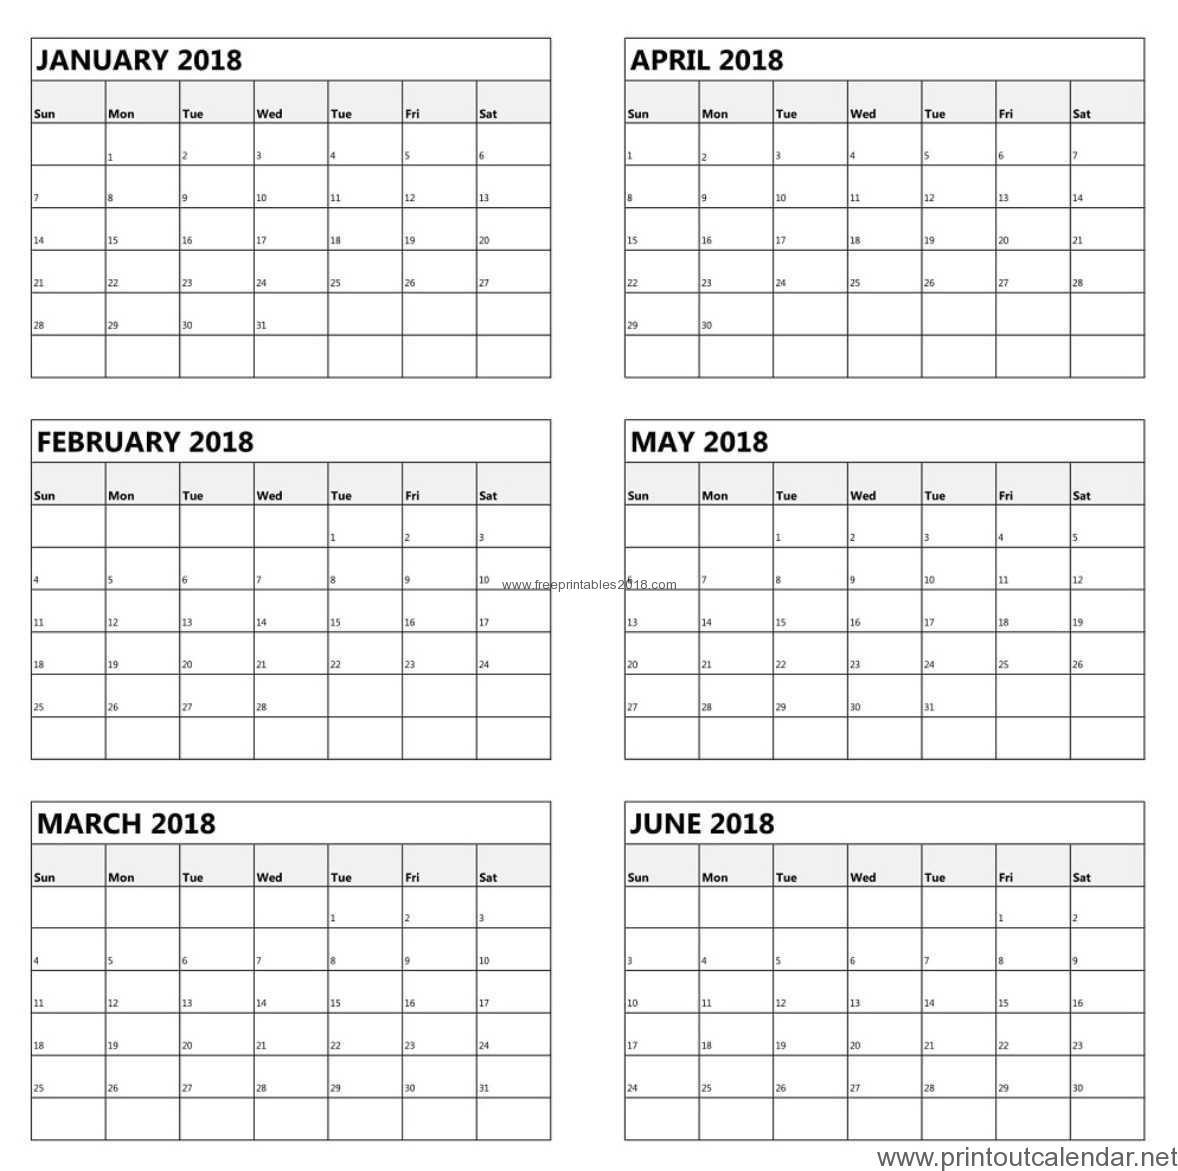 Free Printable 6 Month Calendar 2019 | Free Printables 2019 in Free Printable 6 Month Calendar